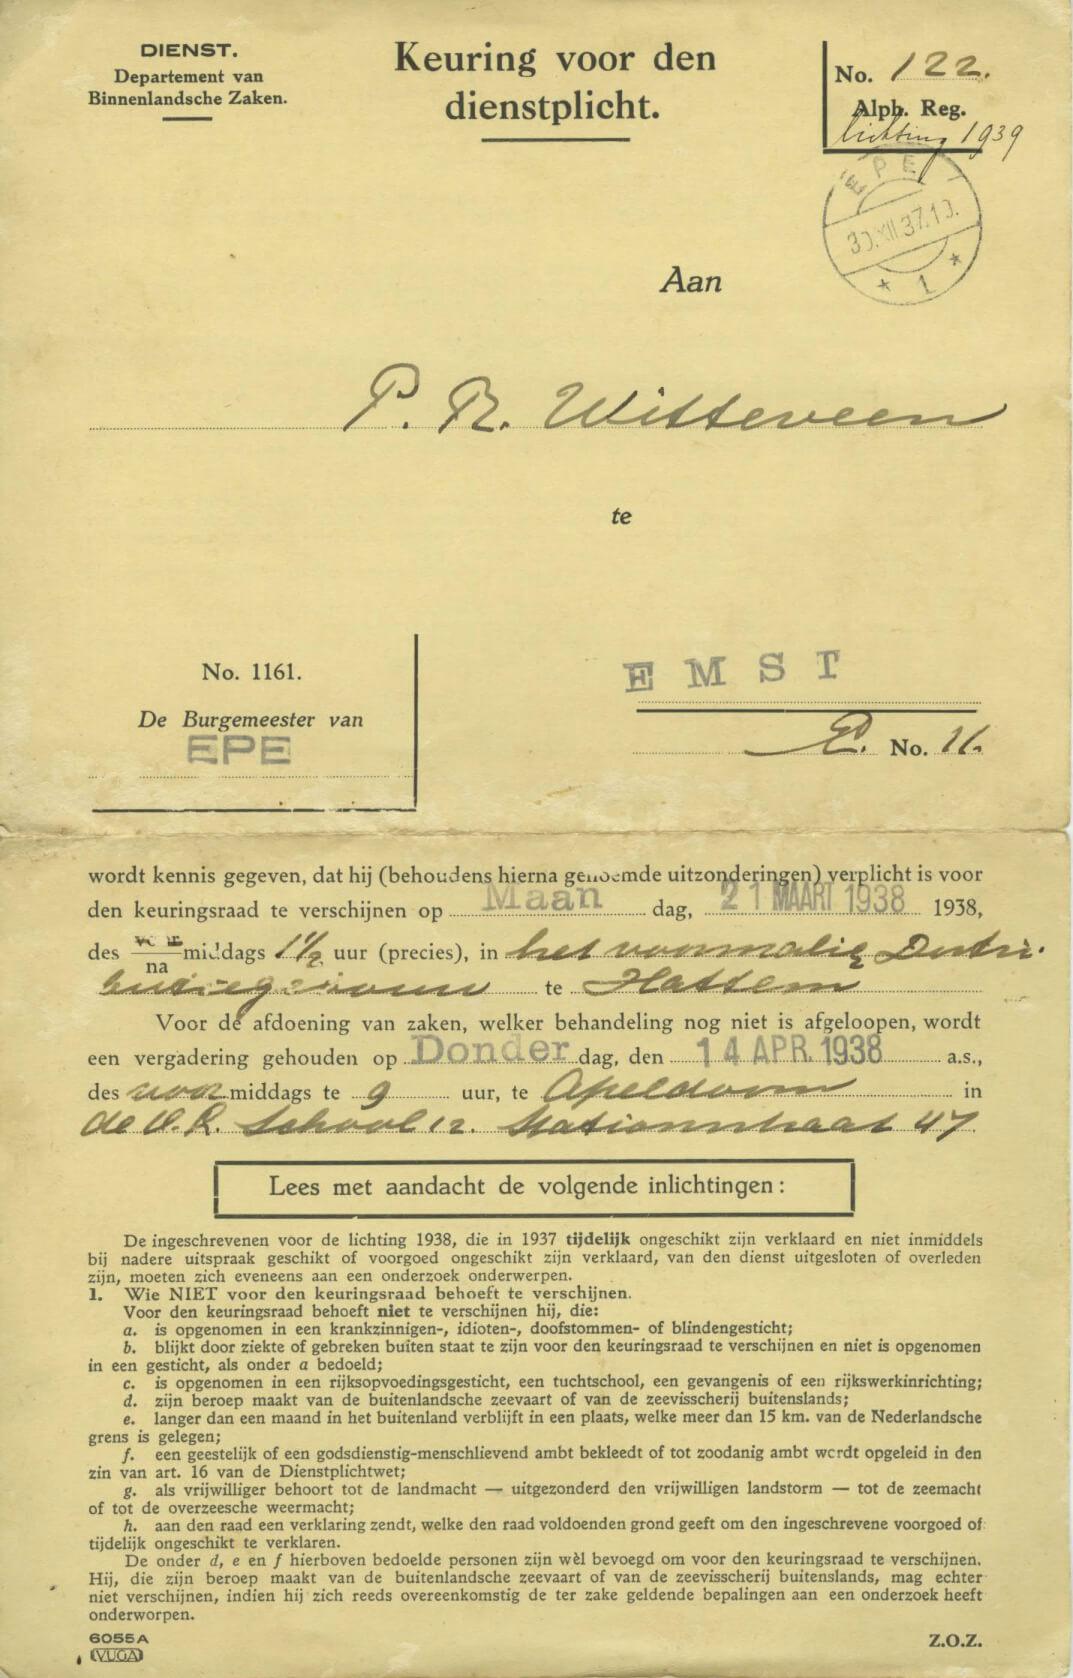 1938 Oproep keuring dienstplicht